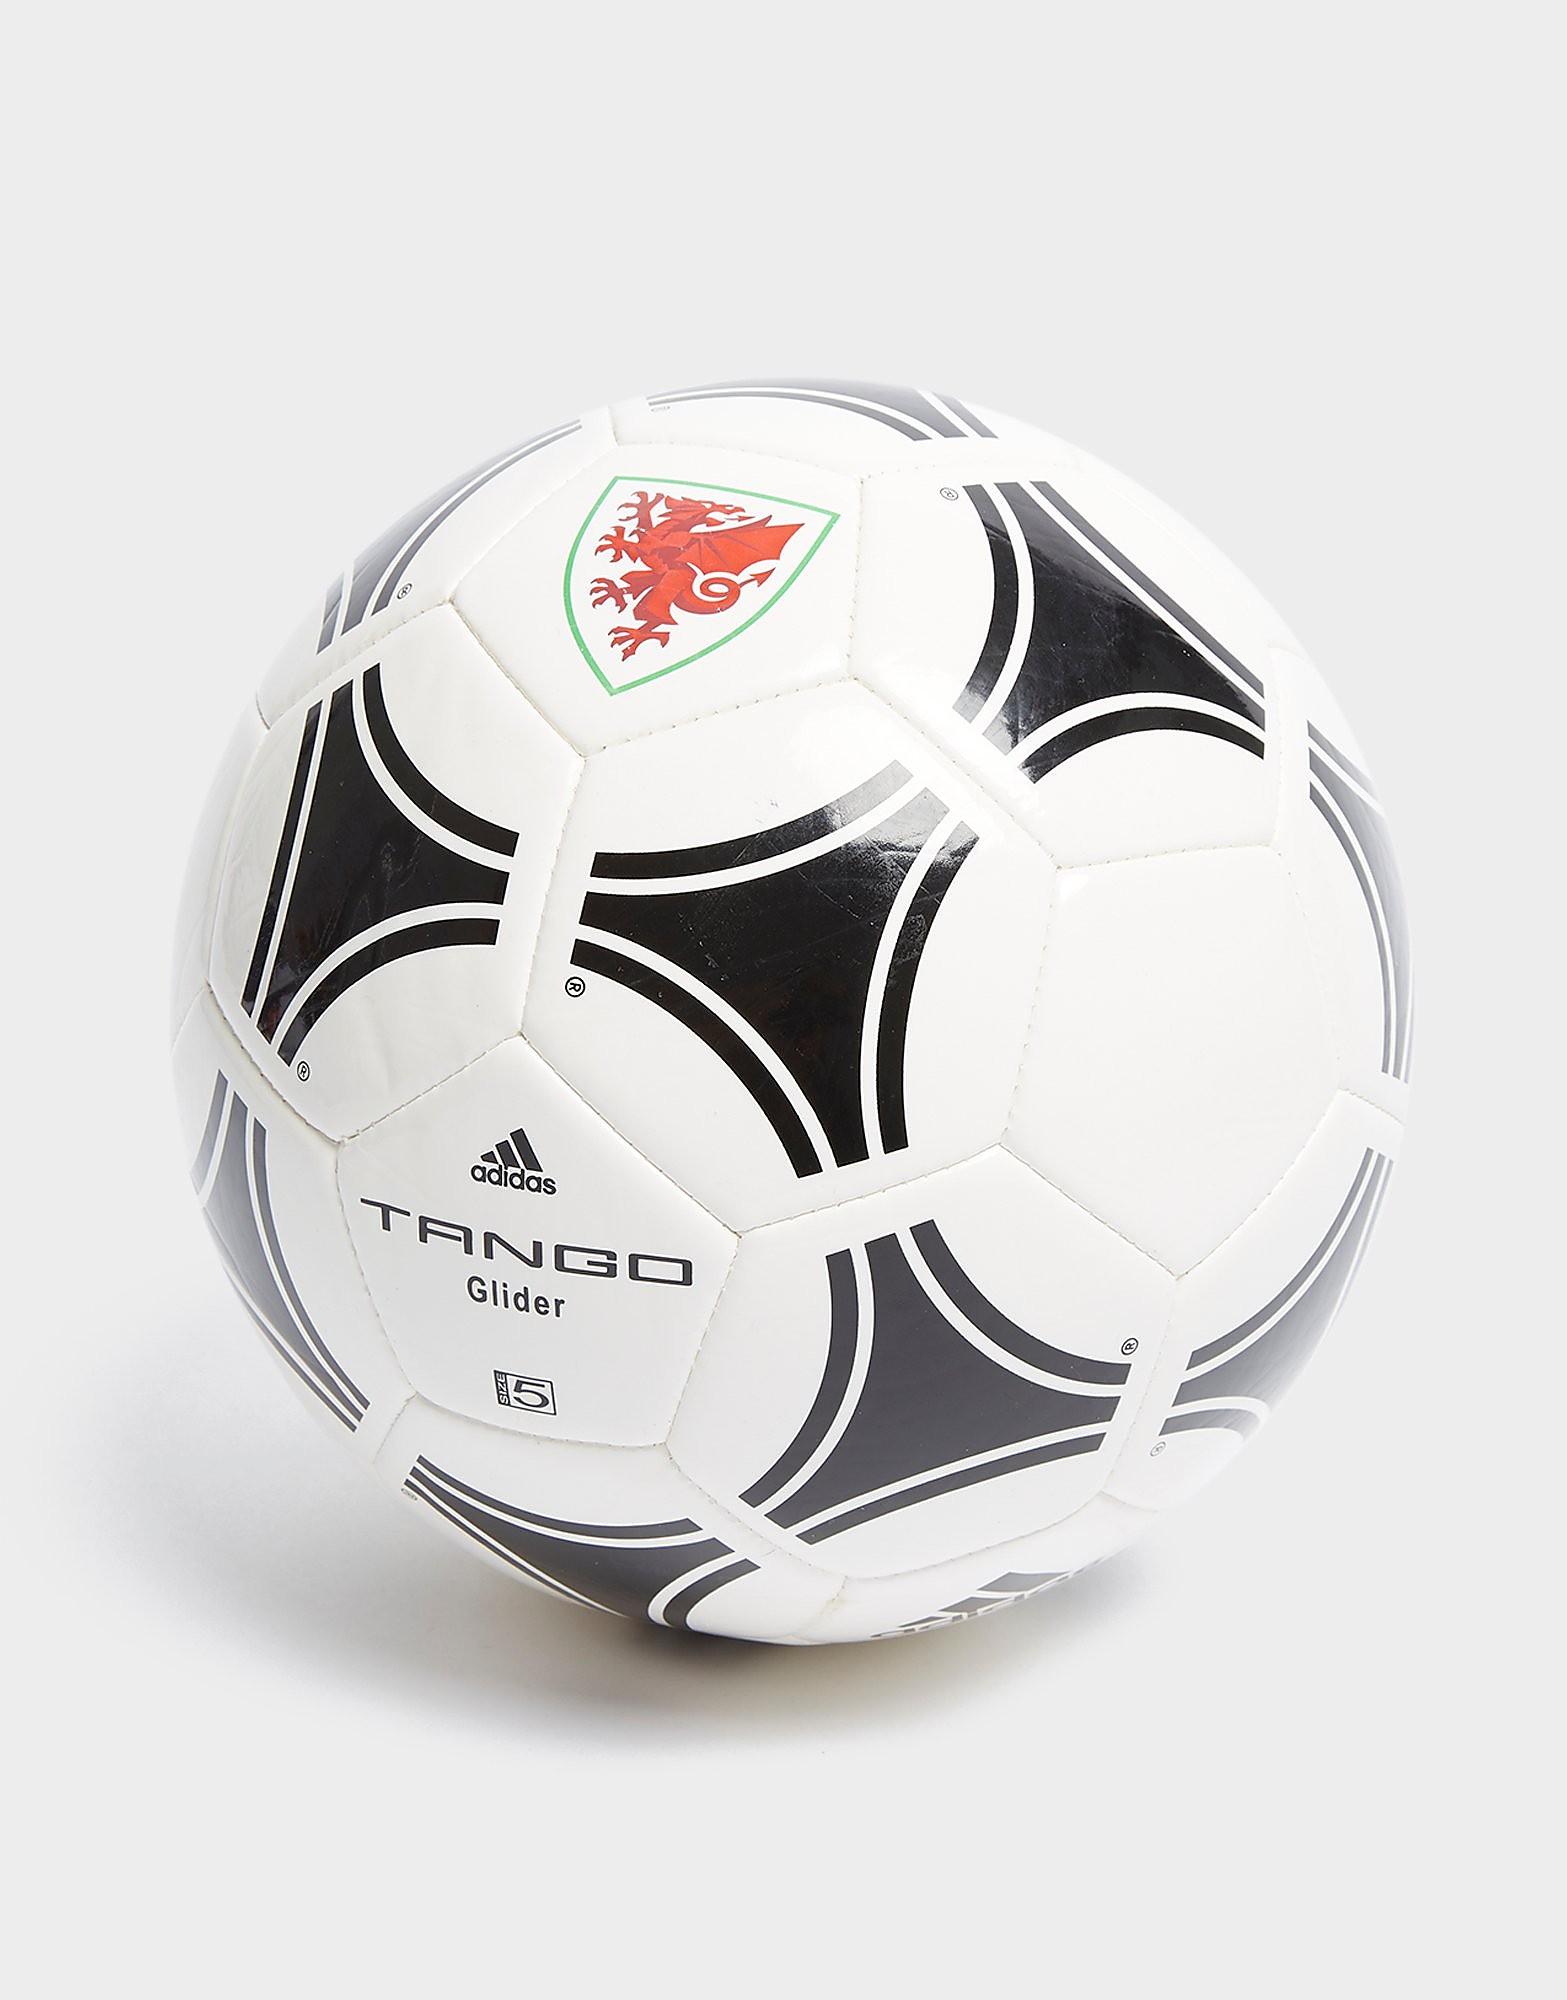 adidas FA Wales Tango fodbold